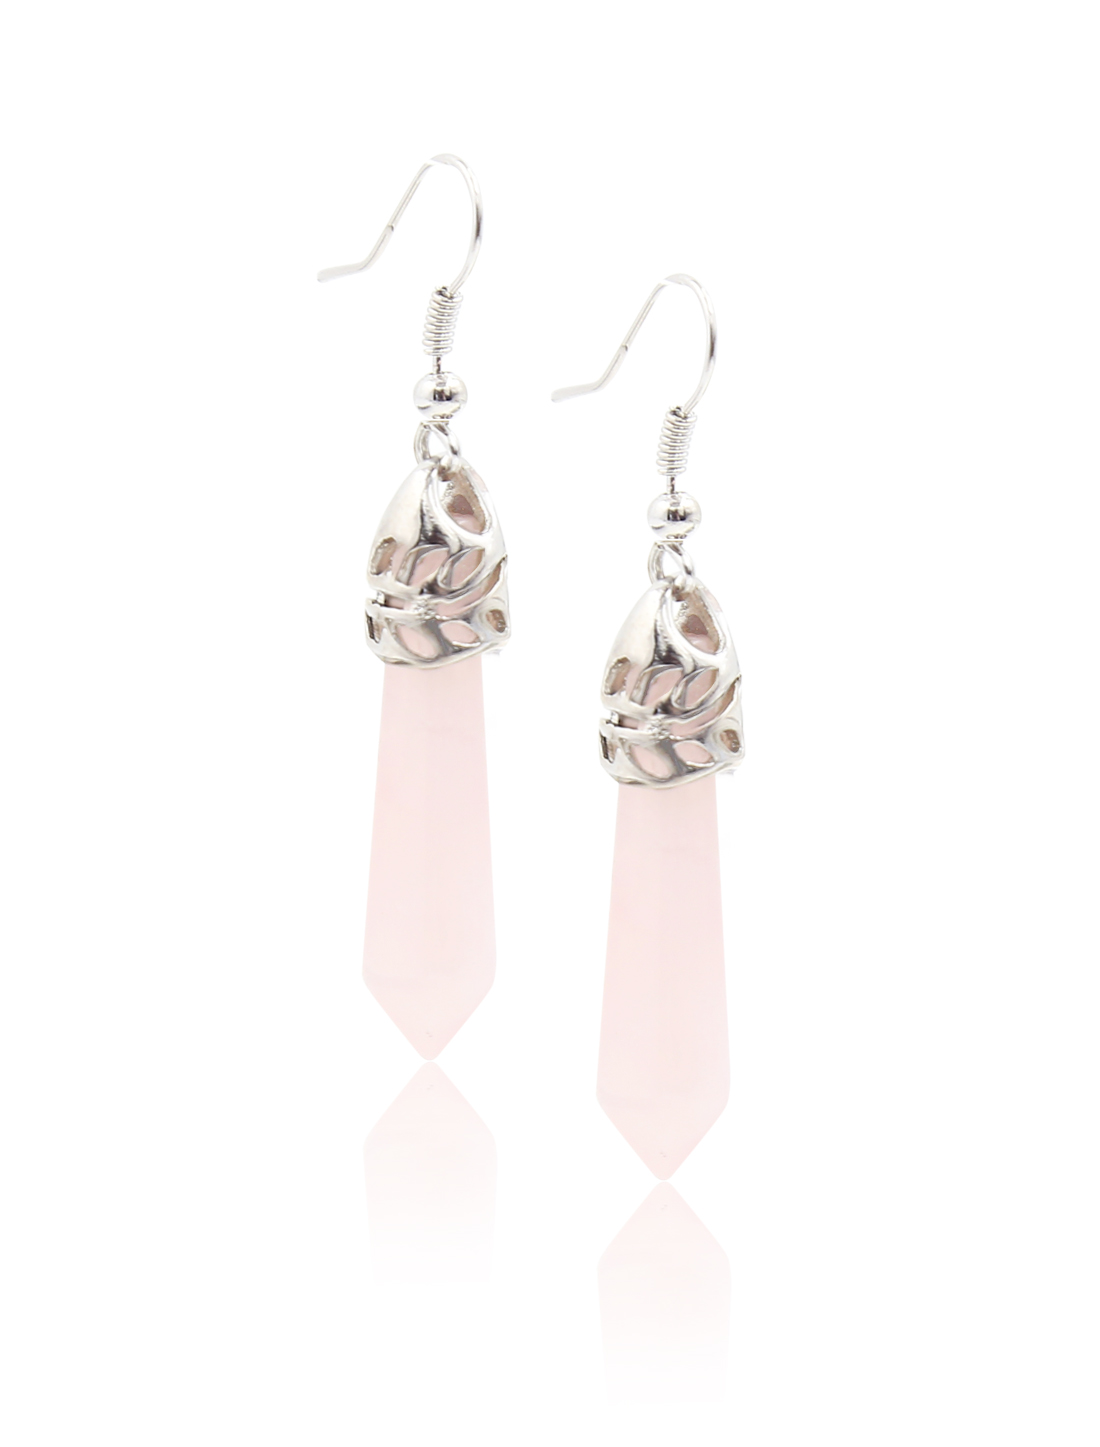 Rose Quartz Natural Gemstone Healing Hexagonal Pointed Reiki Chakra Stud Earring